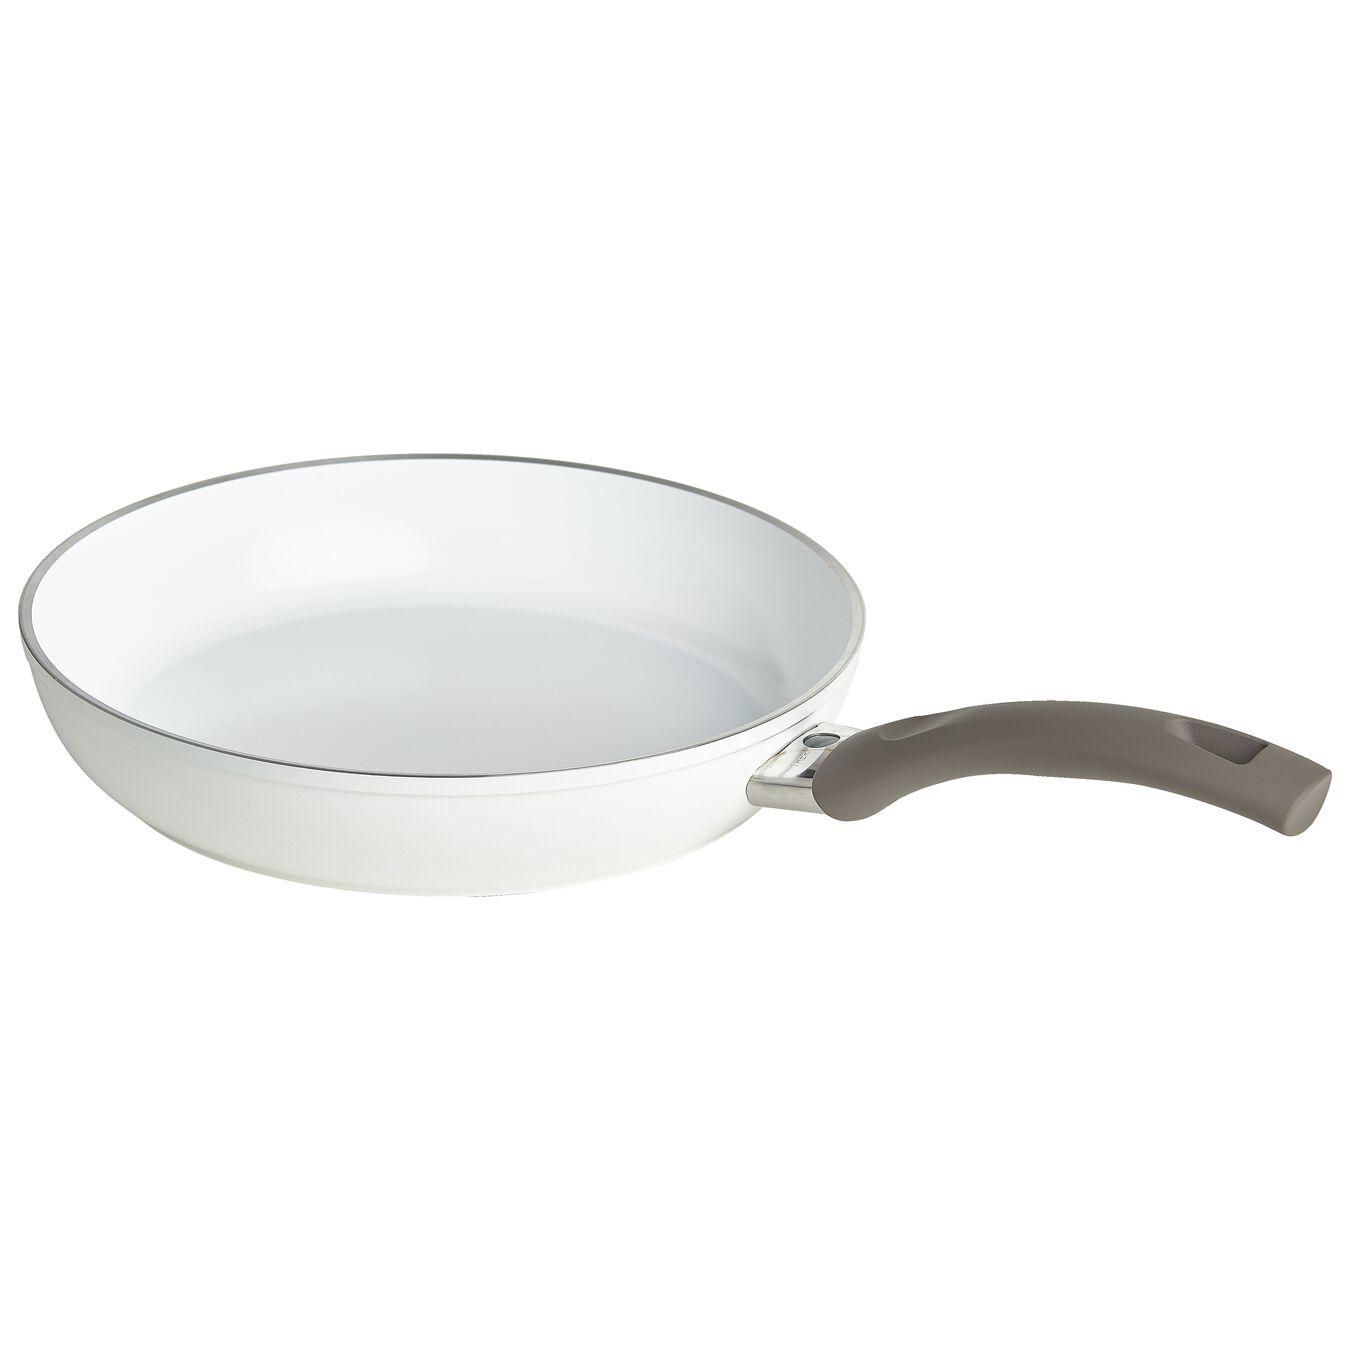 Poêle basse 20 cm, Aluminium, Blanc,,large 1